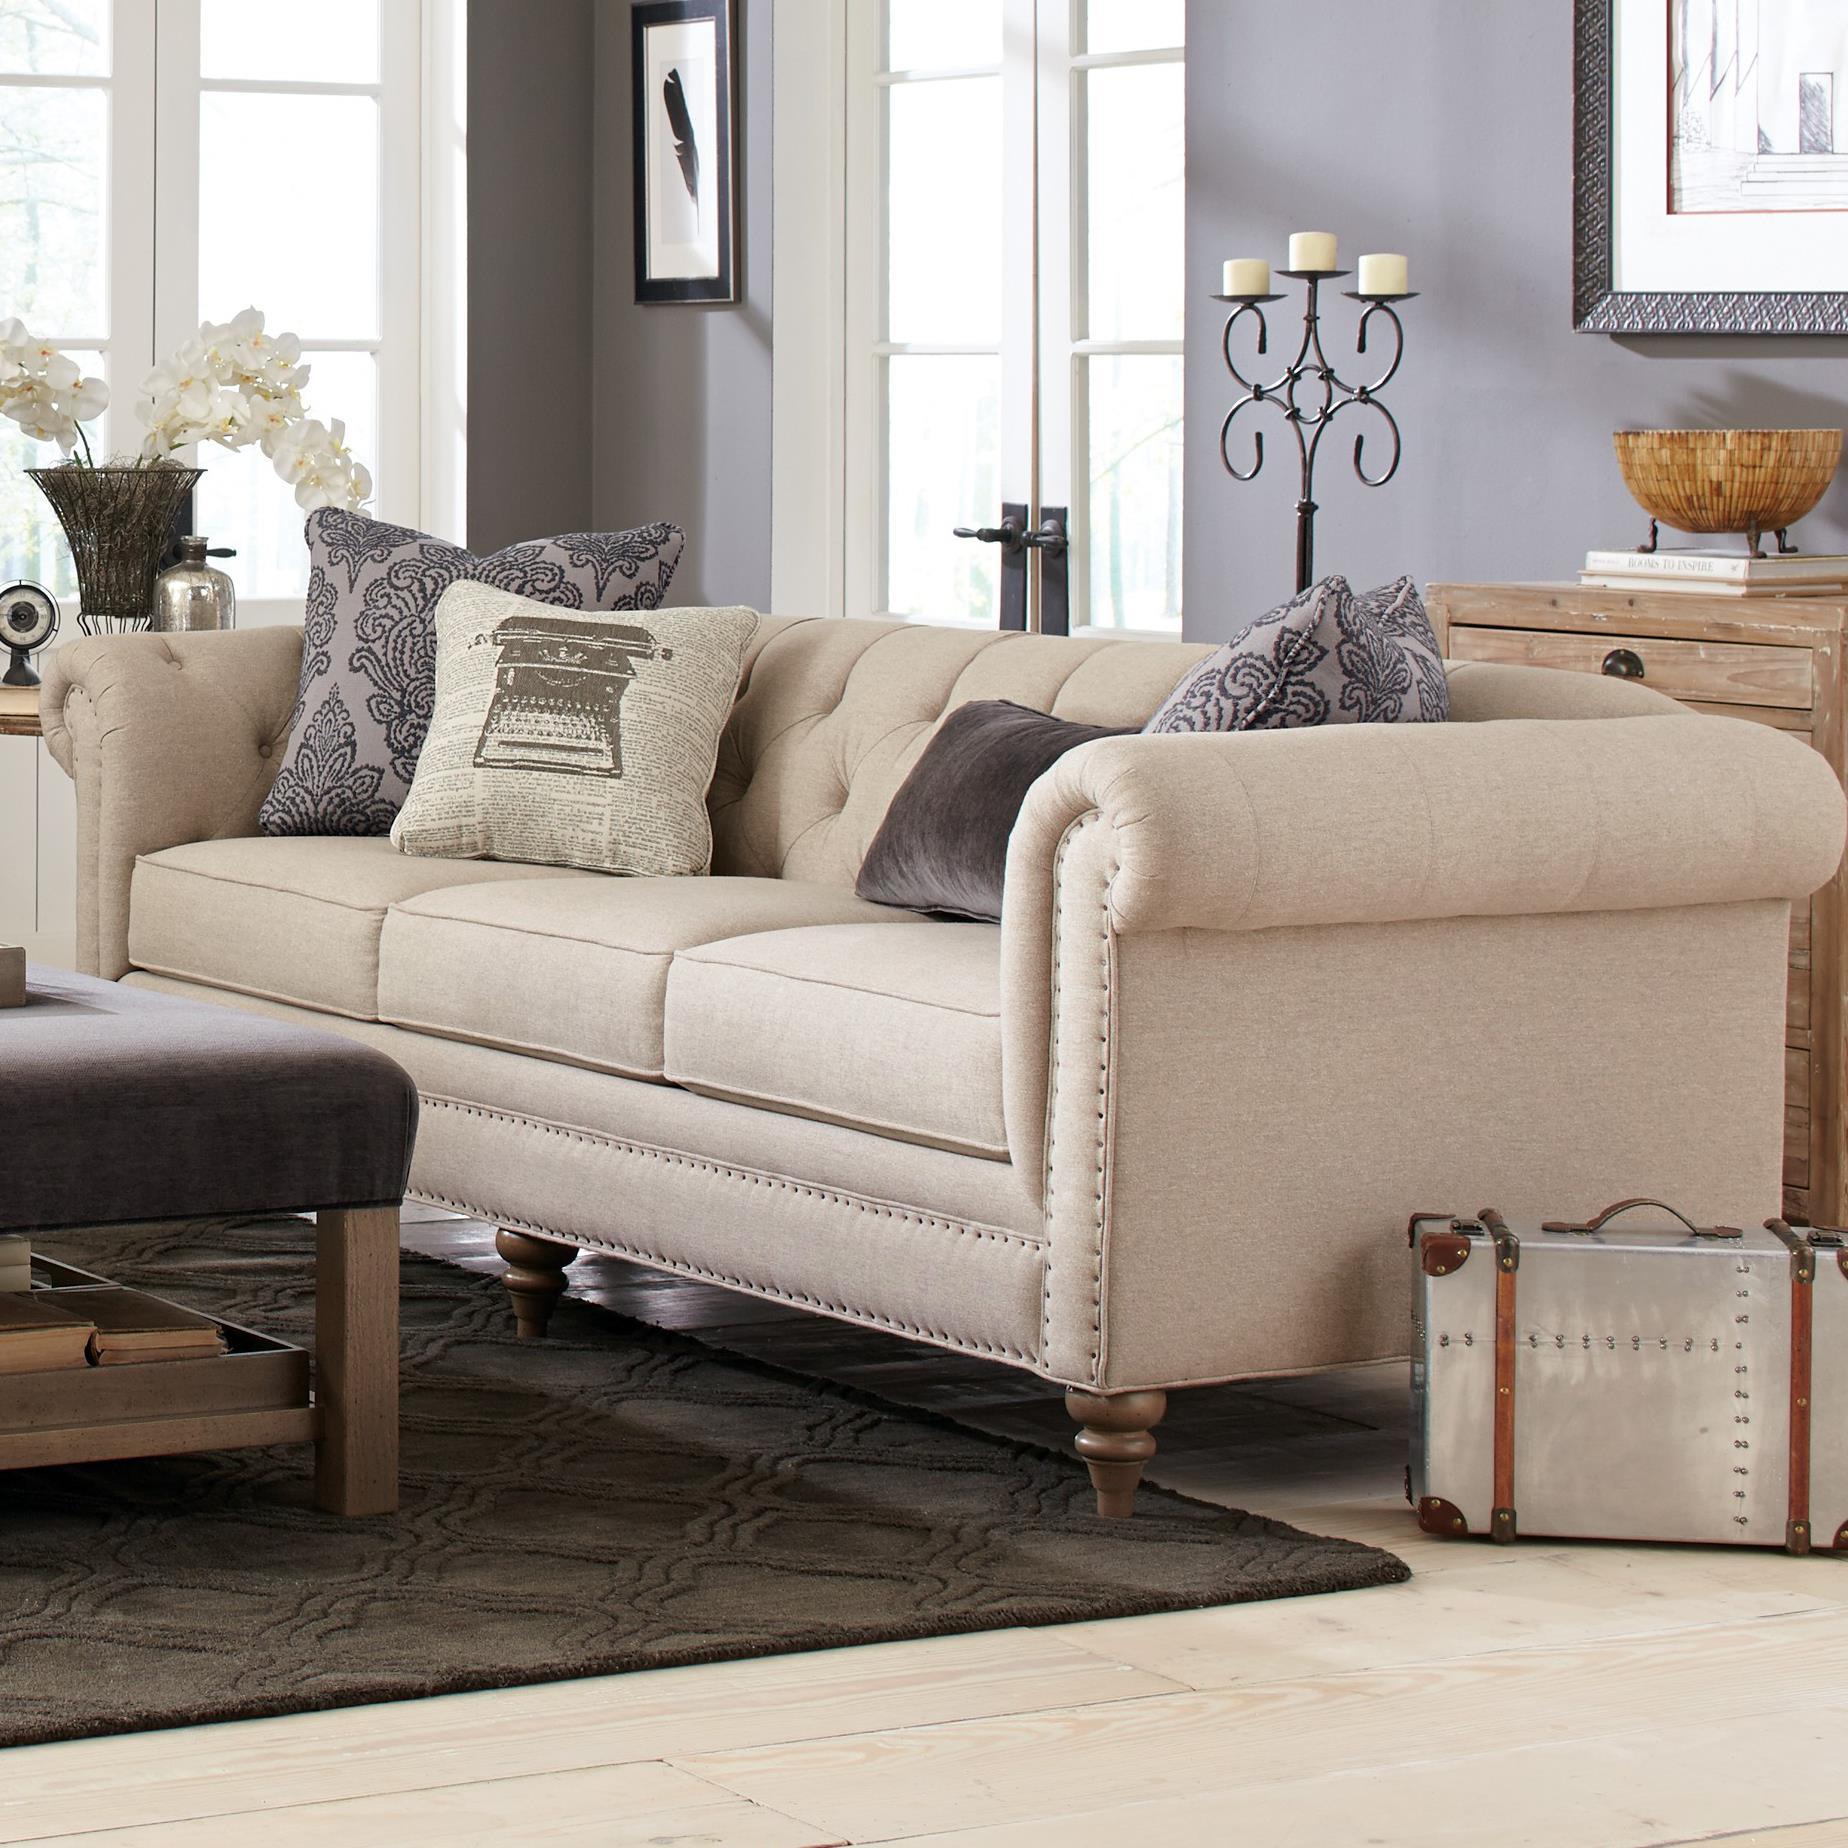 Craftmaster 7431 7432 Standard Sofa with Vintage Tack Nailheads